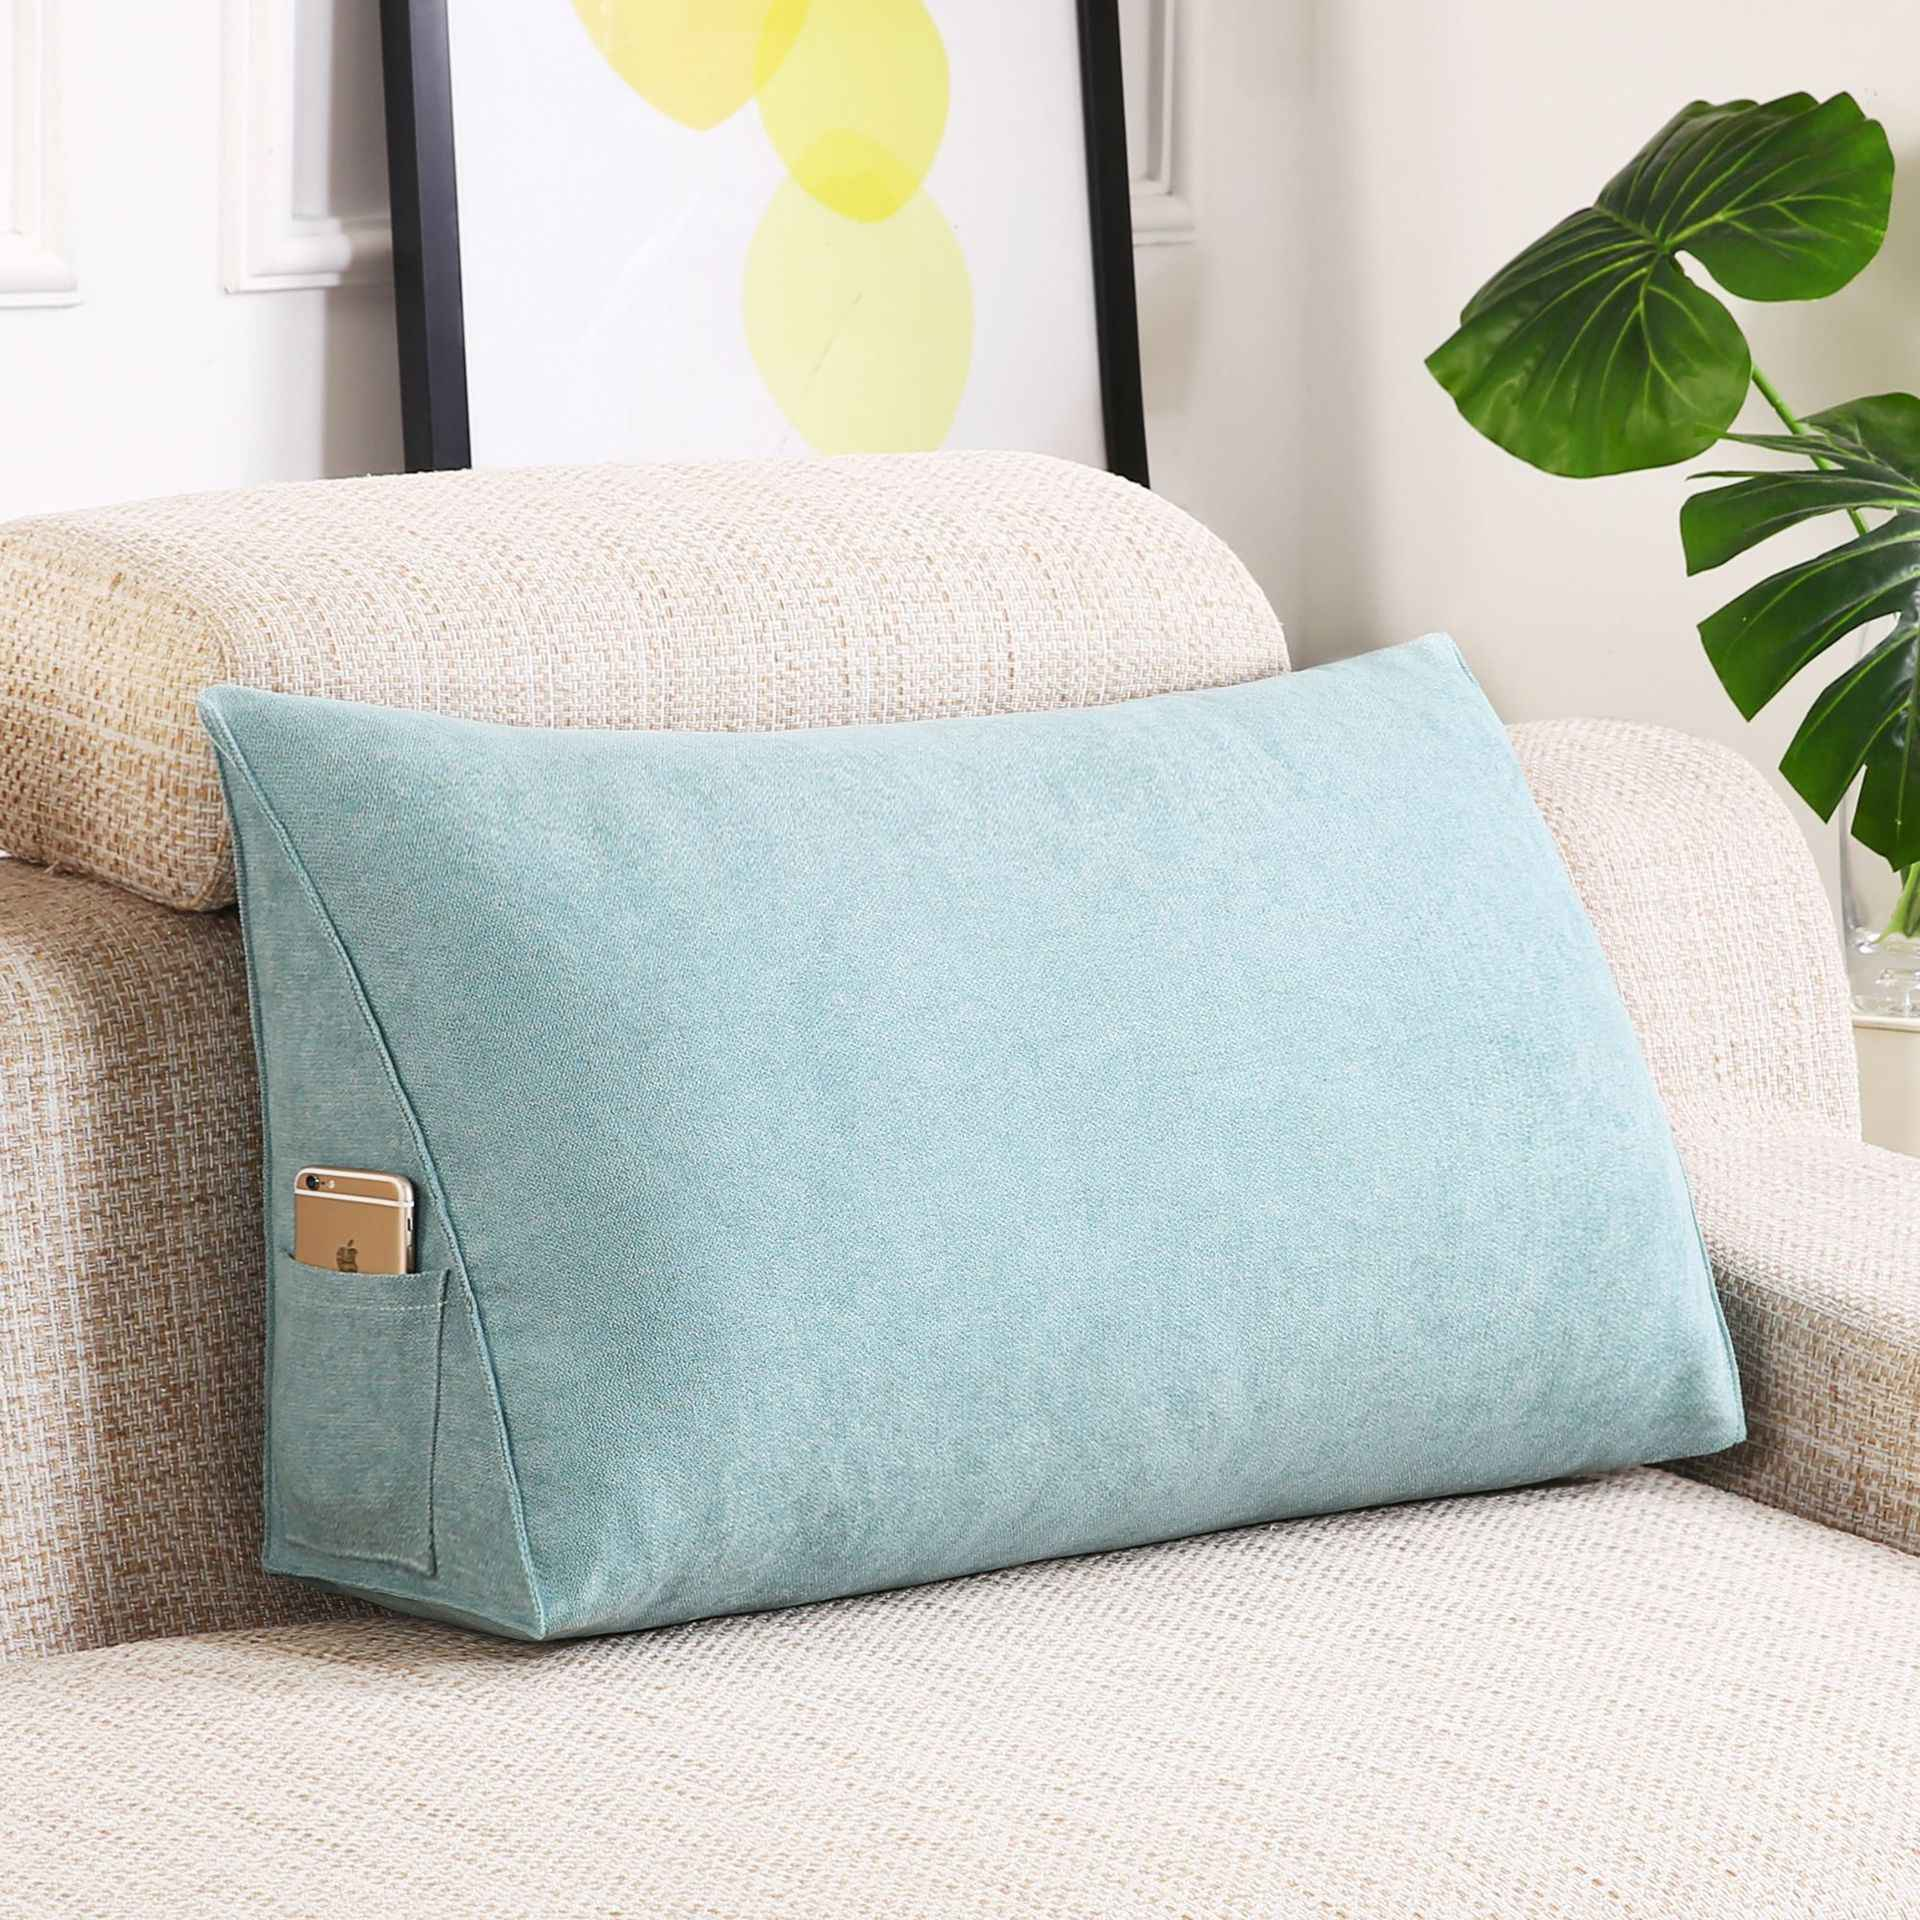 Pillow Cushion Living Room Sofa